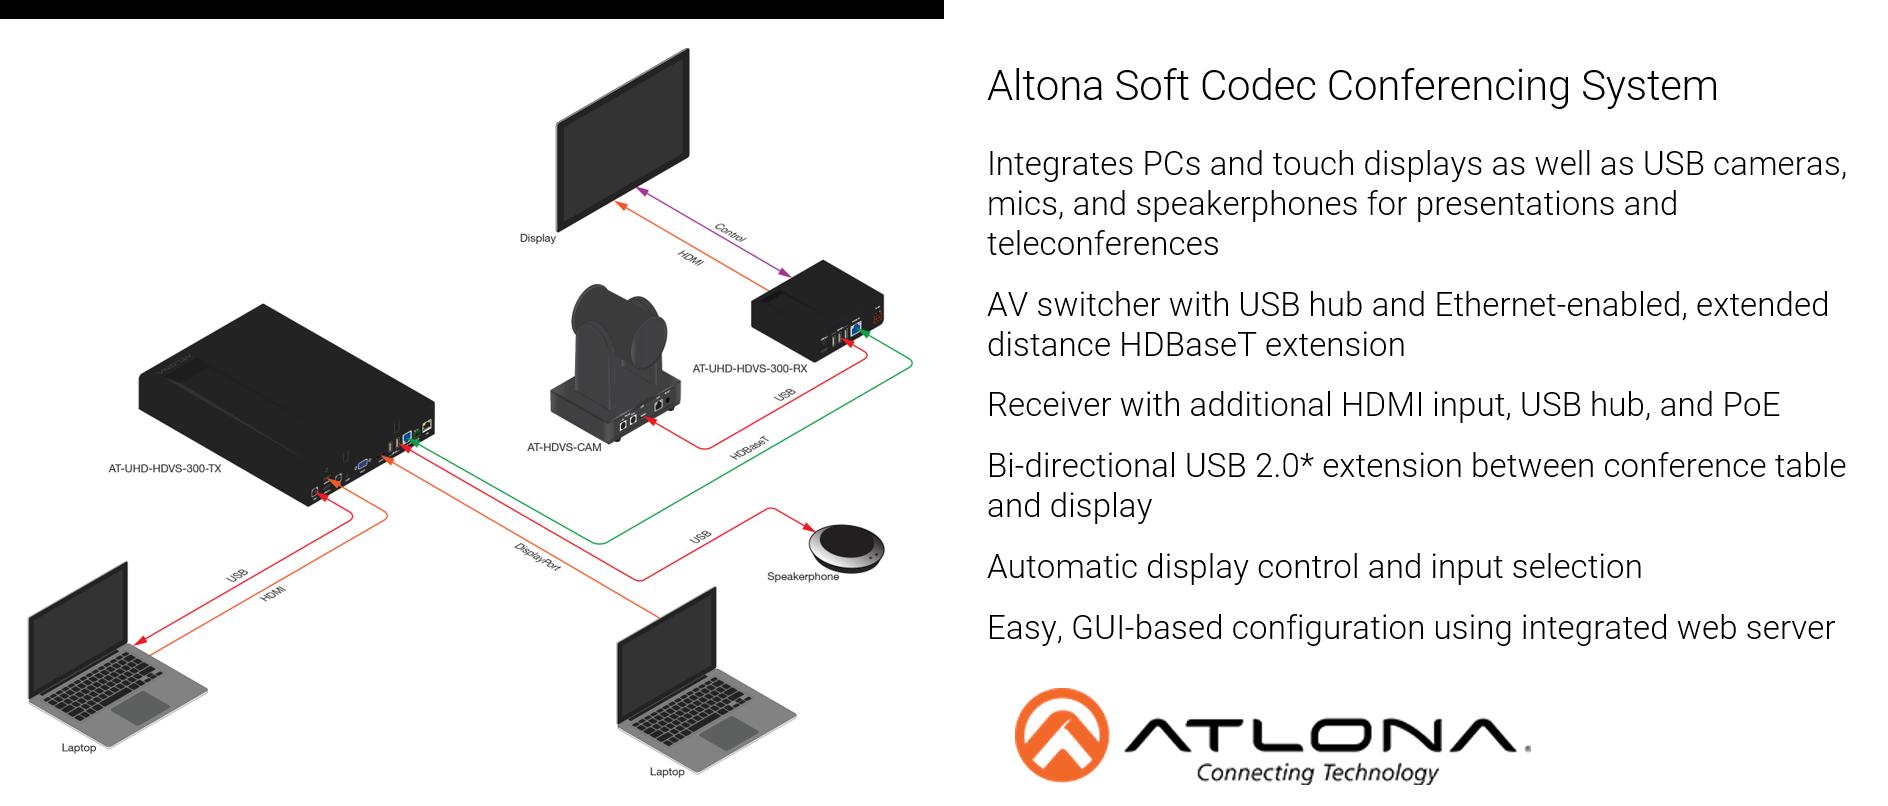 Atlona Soft Codec Design